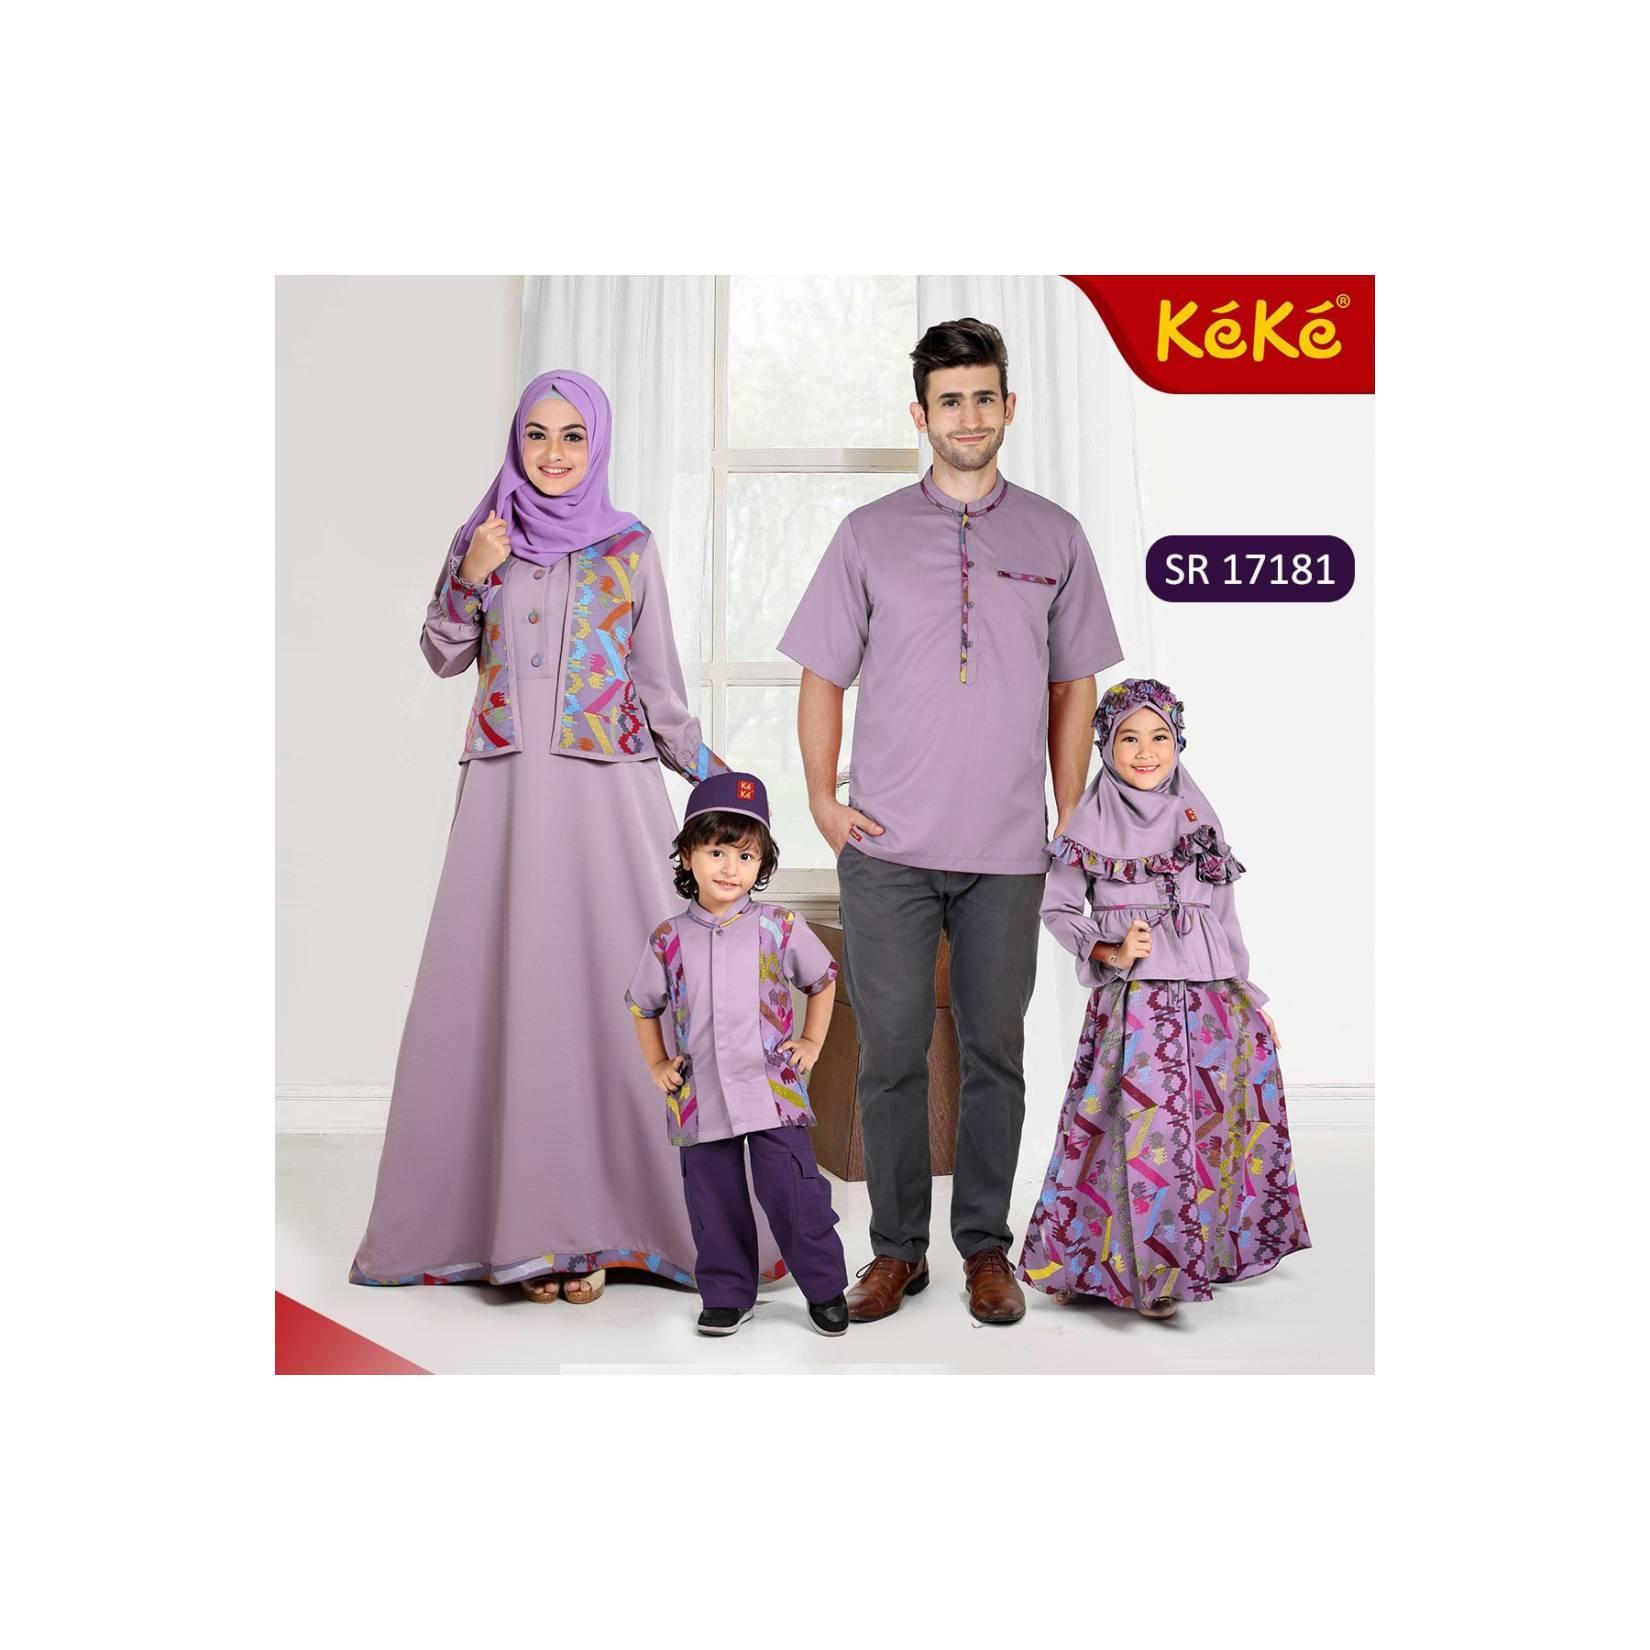 Gamis ibu Sarimbit 01 Keke opsi untuk baju ibu size XS XL